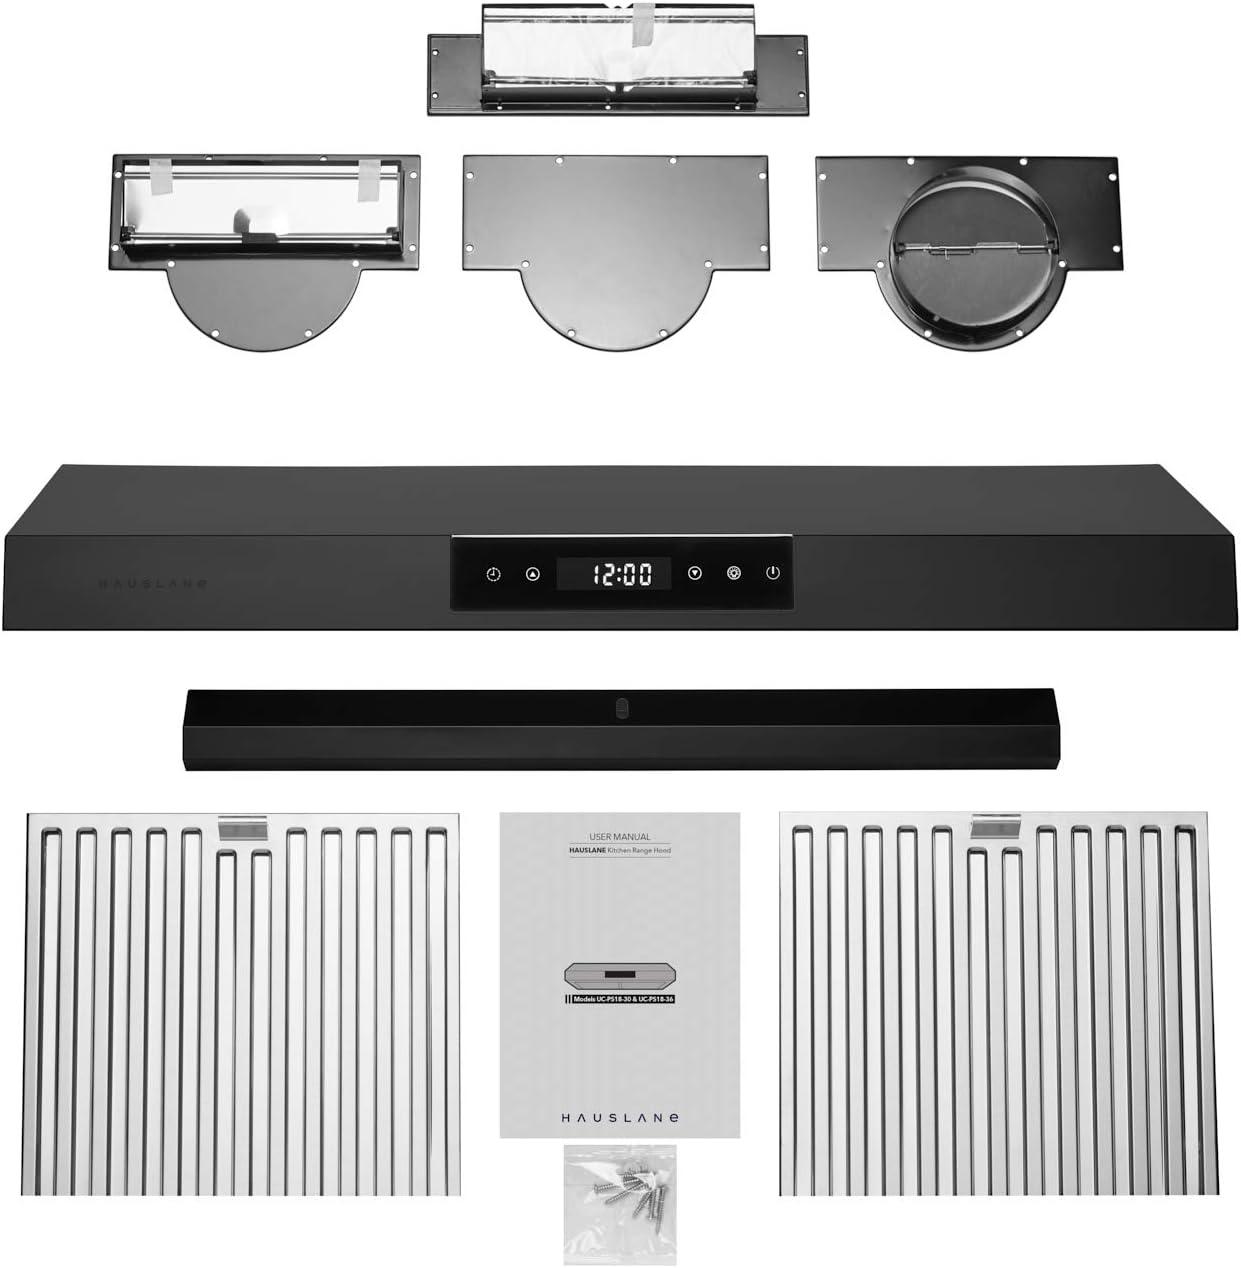 Chef Series 30 PS18 Under Cabinet Range Hood 3-Way Venting ...